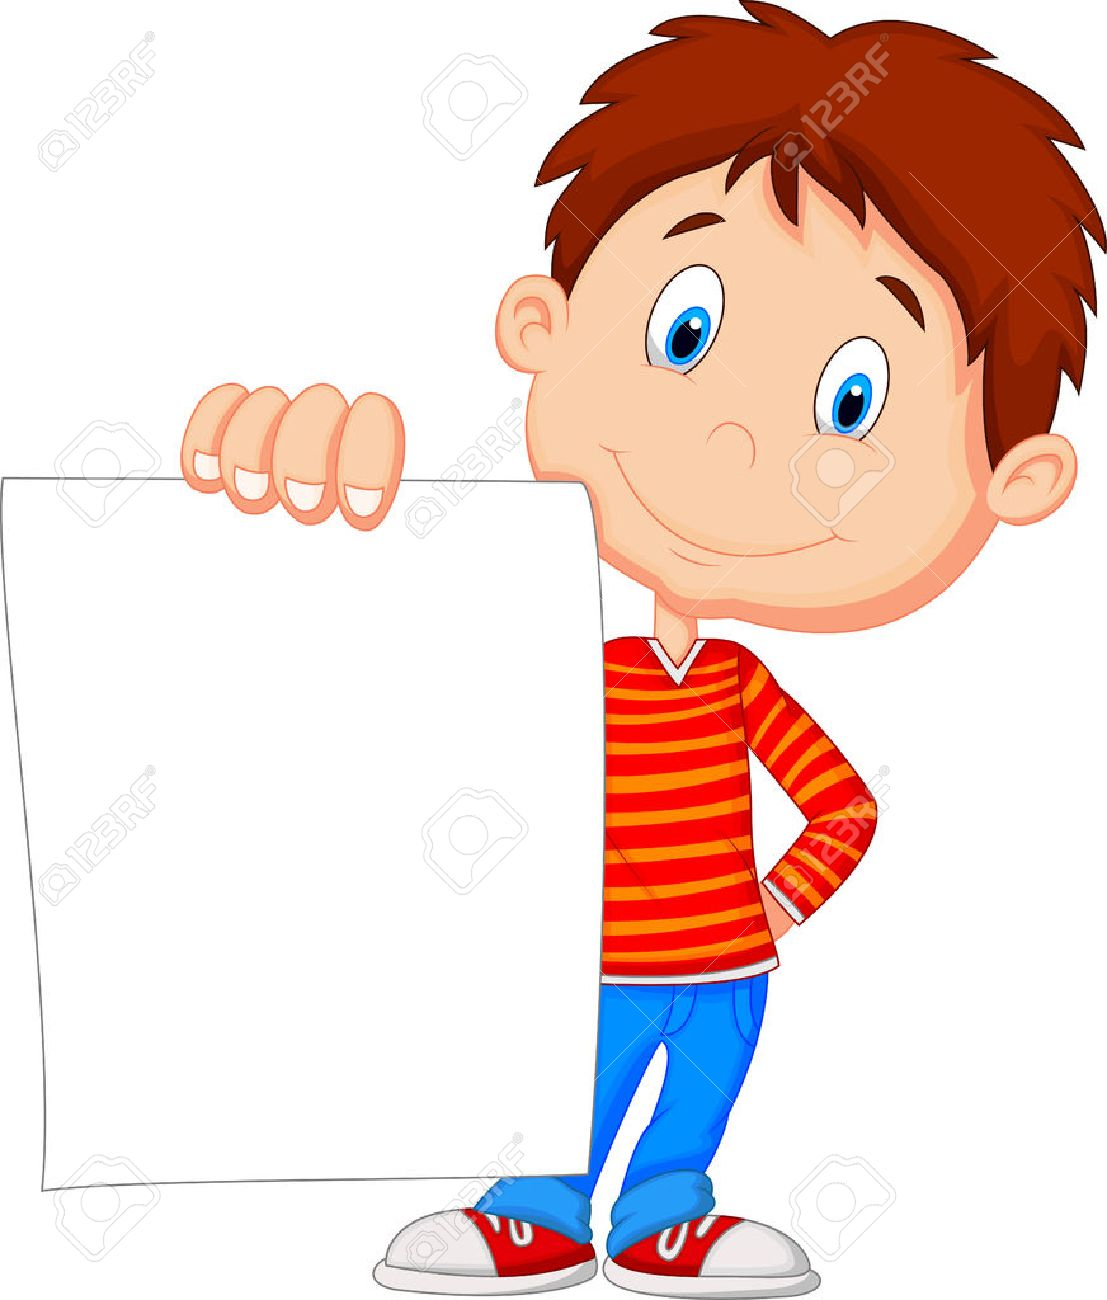 student cartoon cartoon boy holding blank paper - Cartoon Picture Of Child